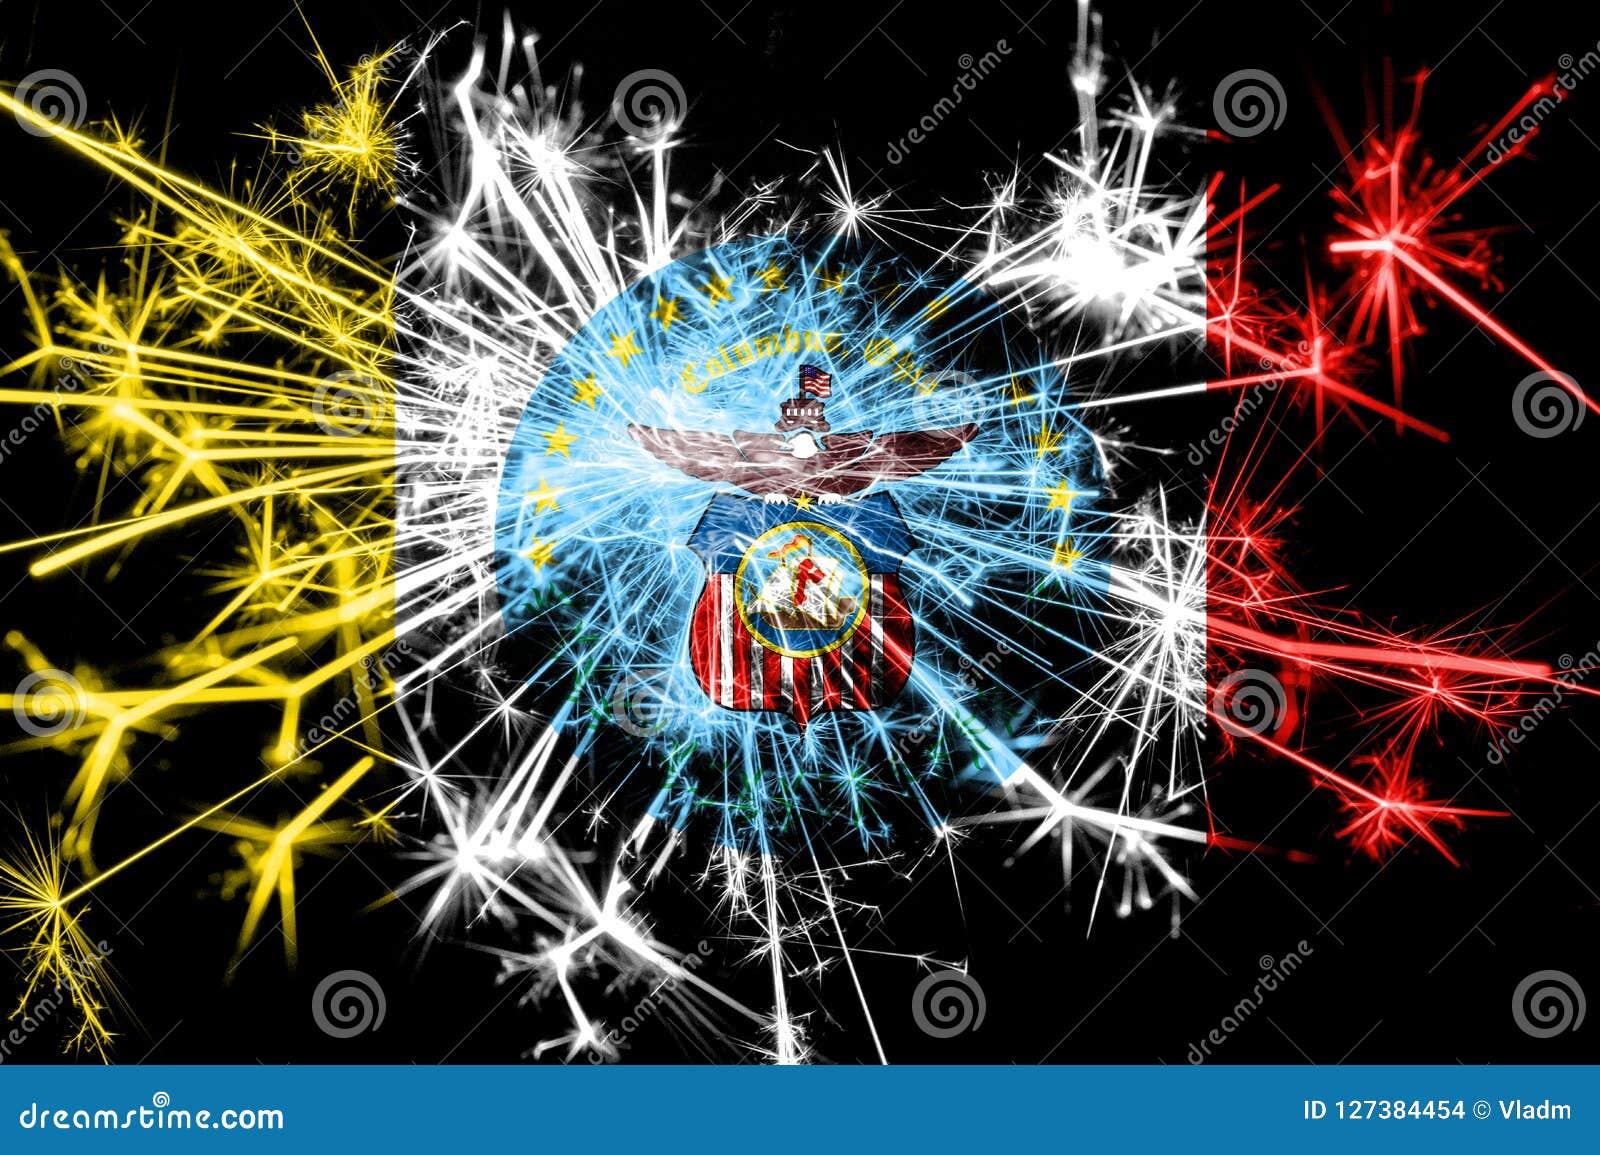 Christmas In Columbus Ohio 2019 Columbus, Ohio Fireworks Sparkling Flag. New Year 2019 And